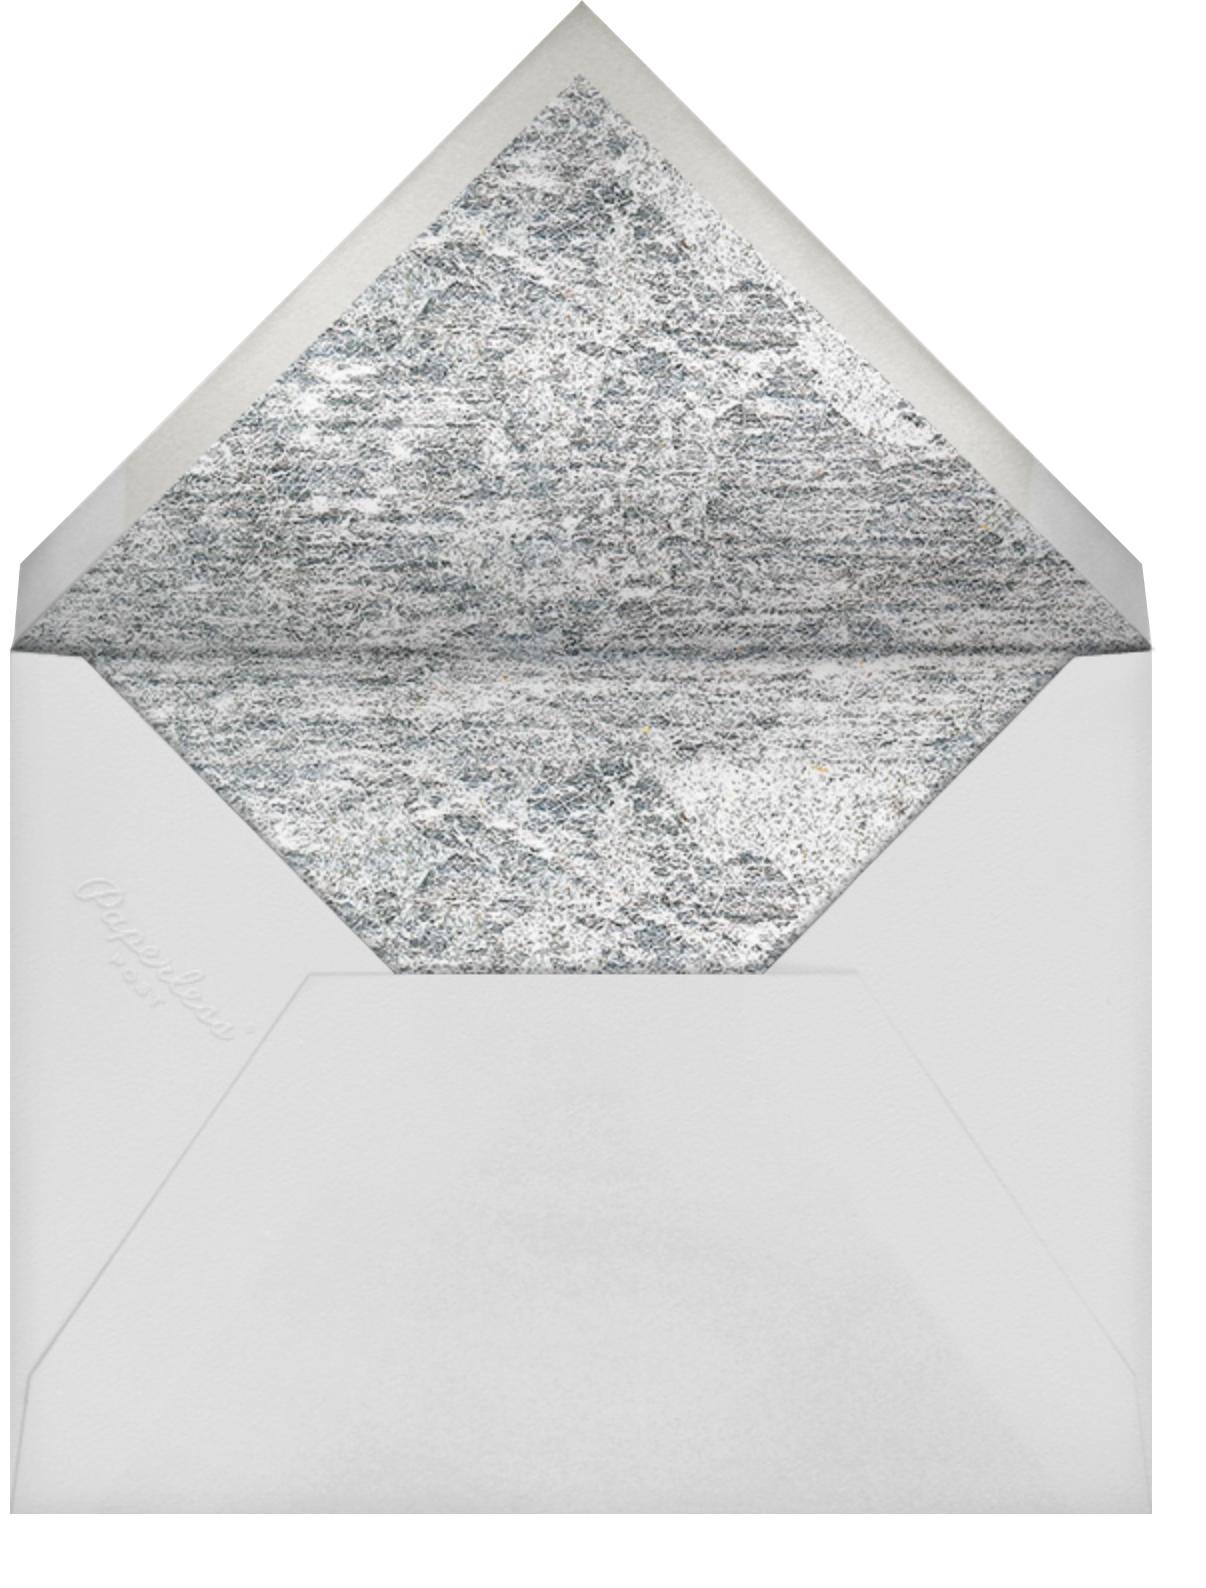 Jubilee (Photo) - Gold - Kelly Wearstler - Adult birthday - envelope back